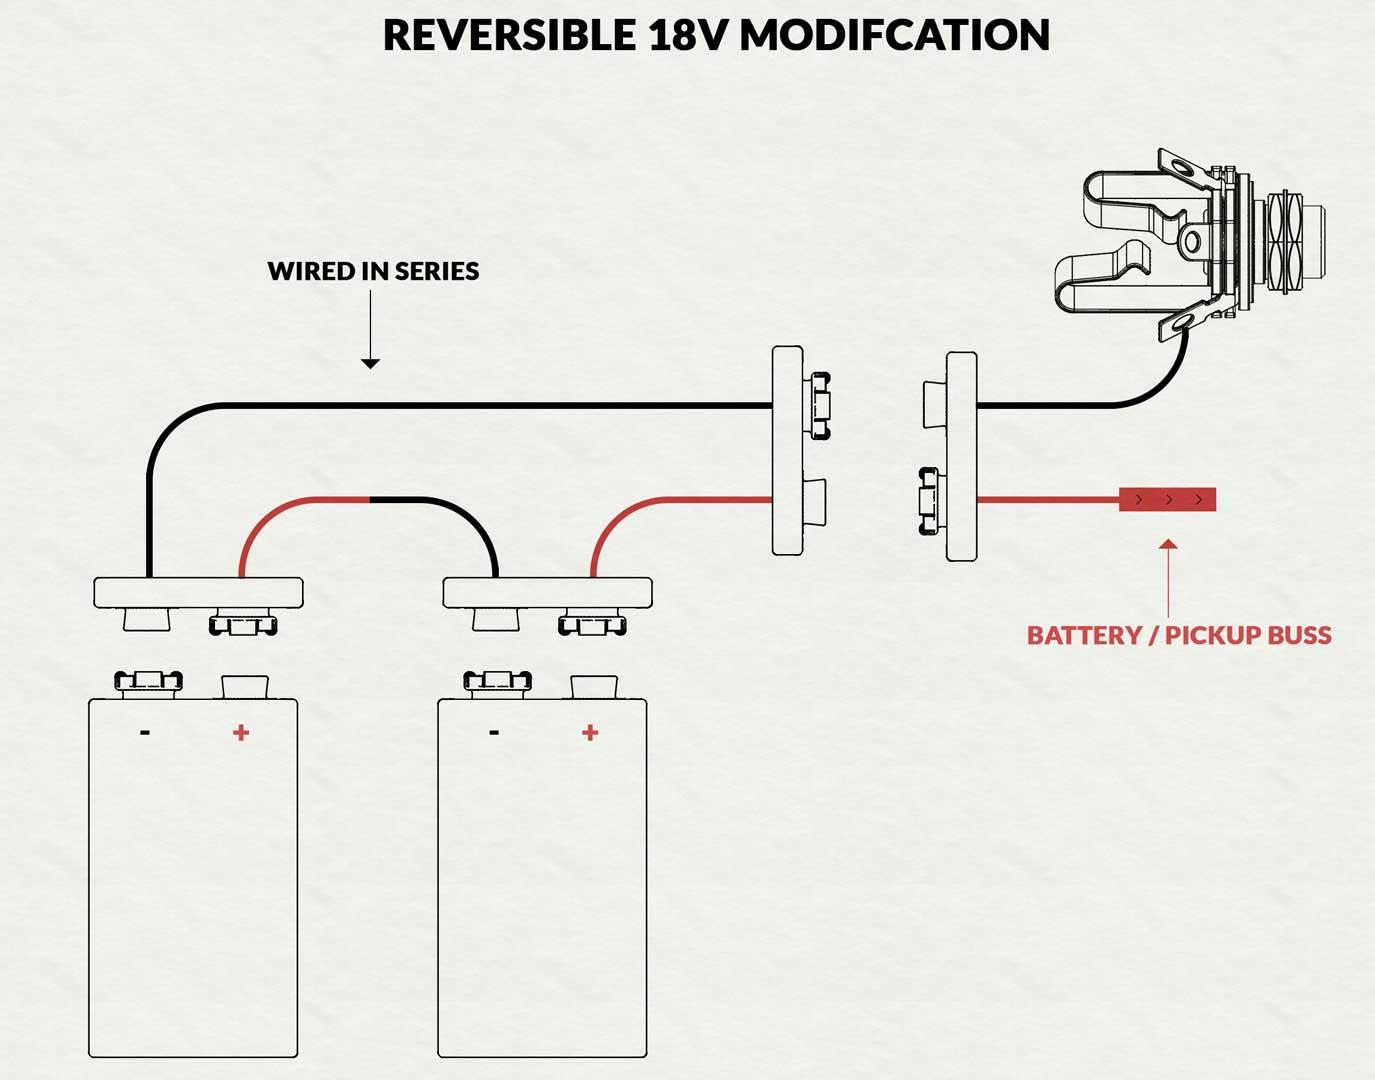 18v Battery Modification For Active Pickups